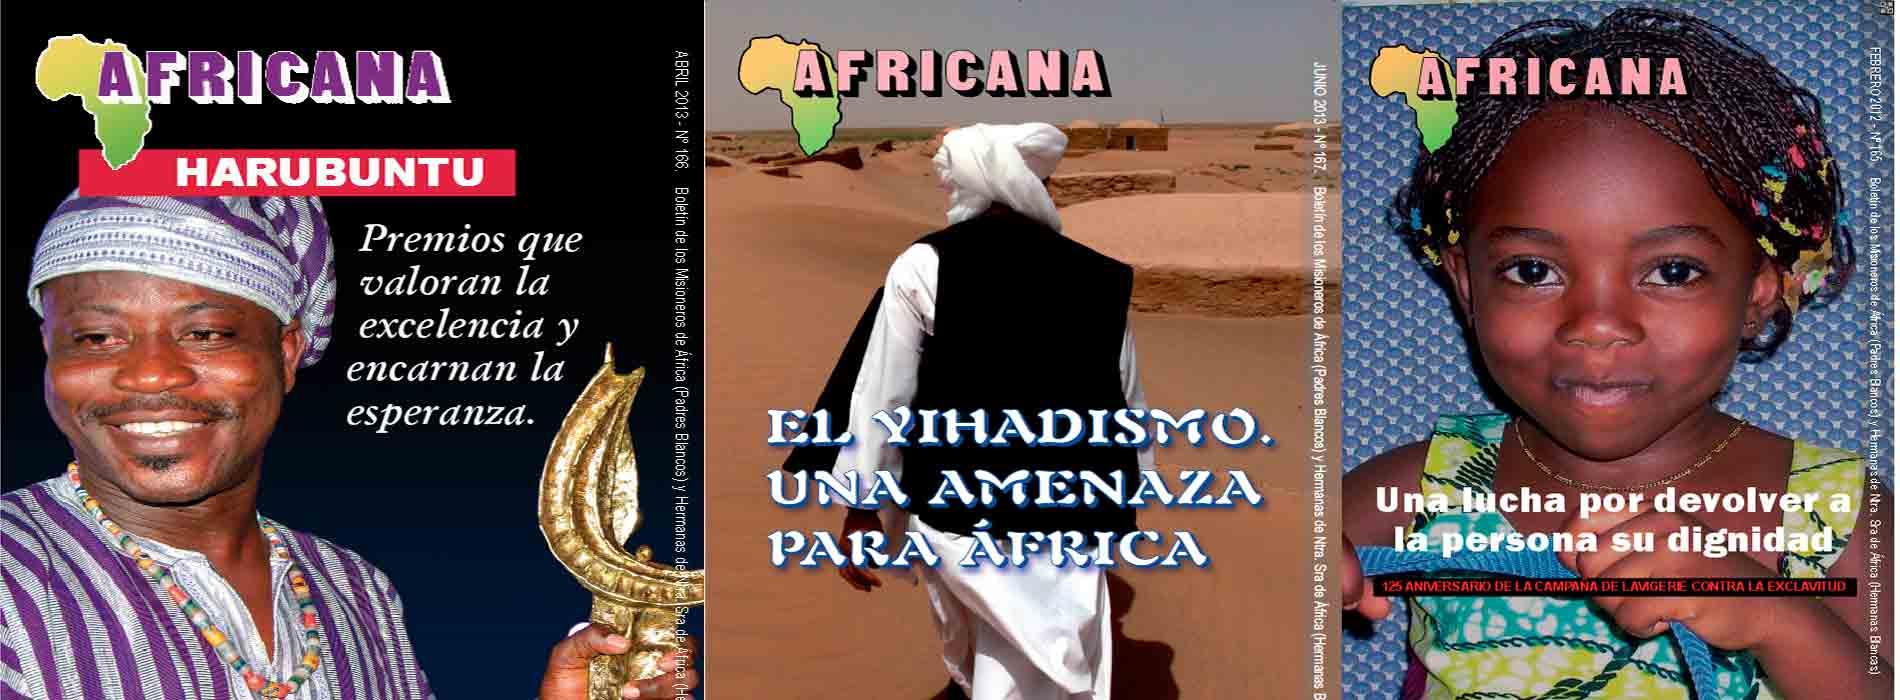 slide-africana